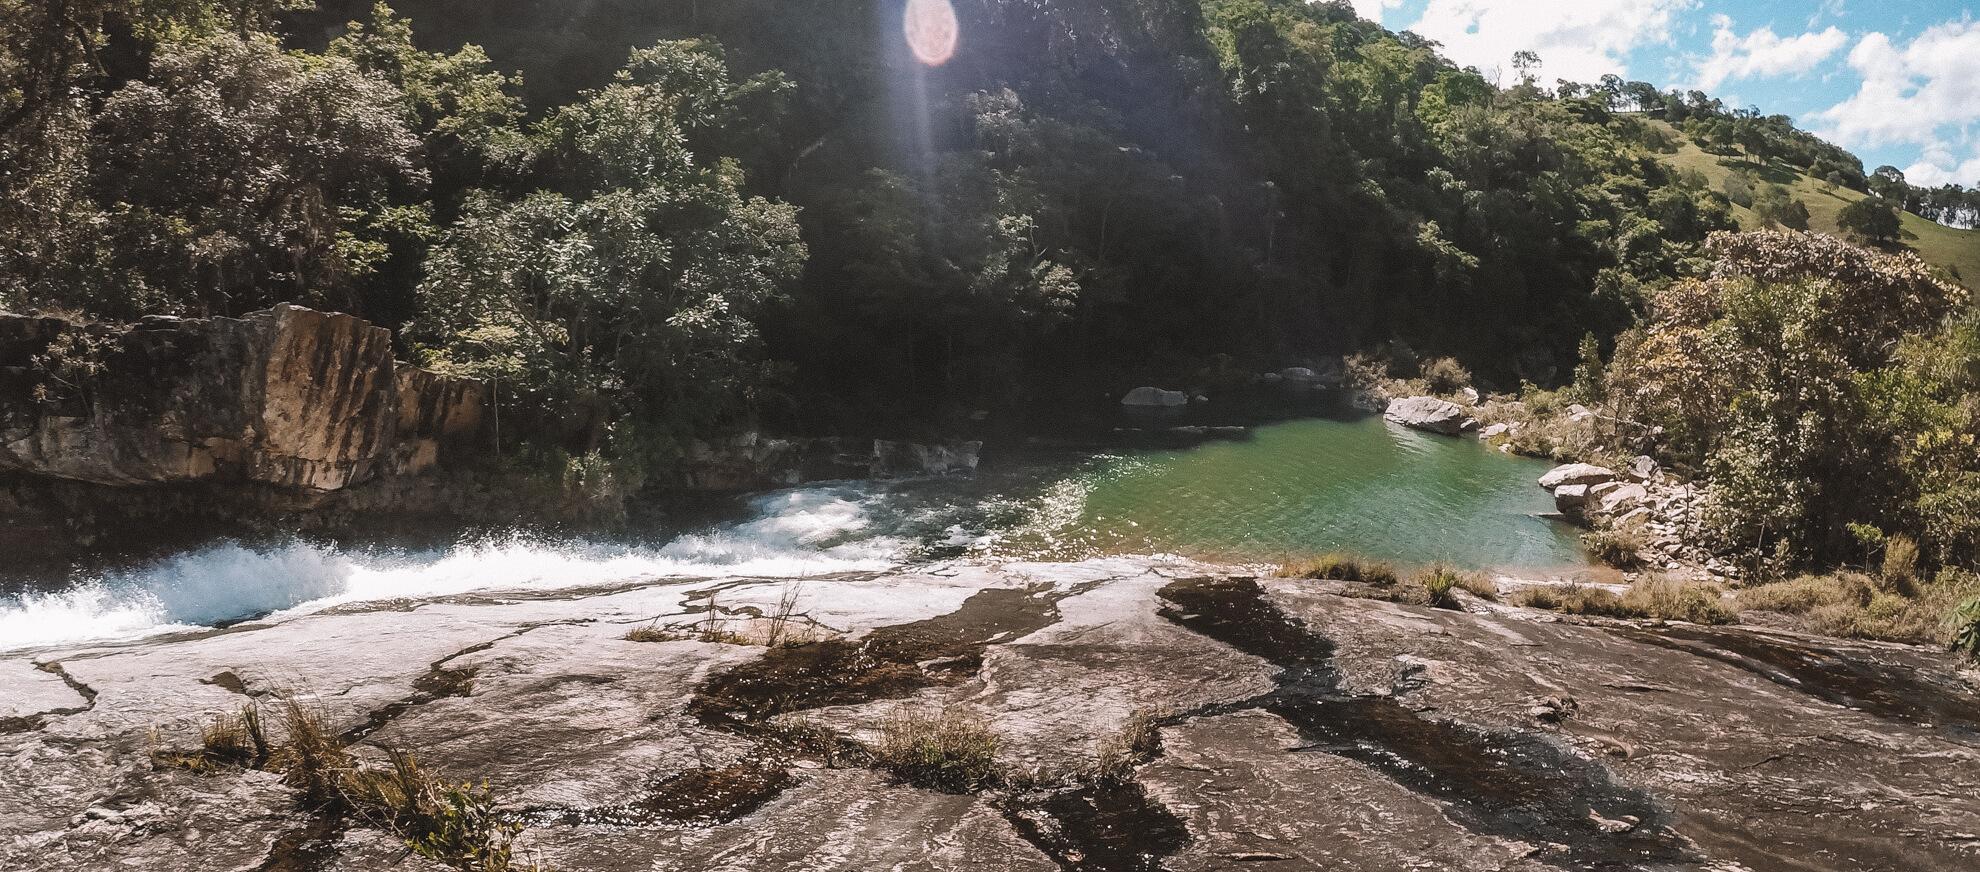 Cachoeira da Proa - Carrancas MG